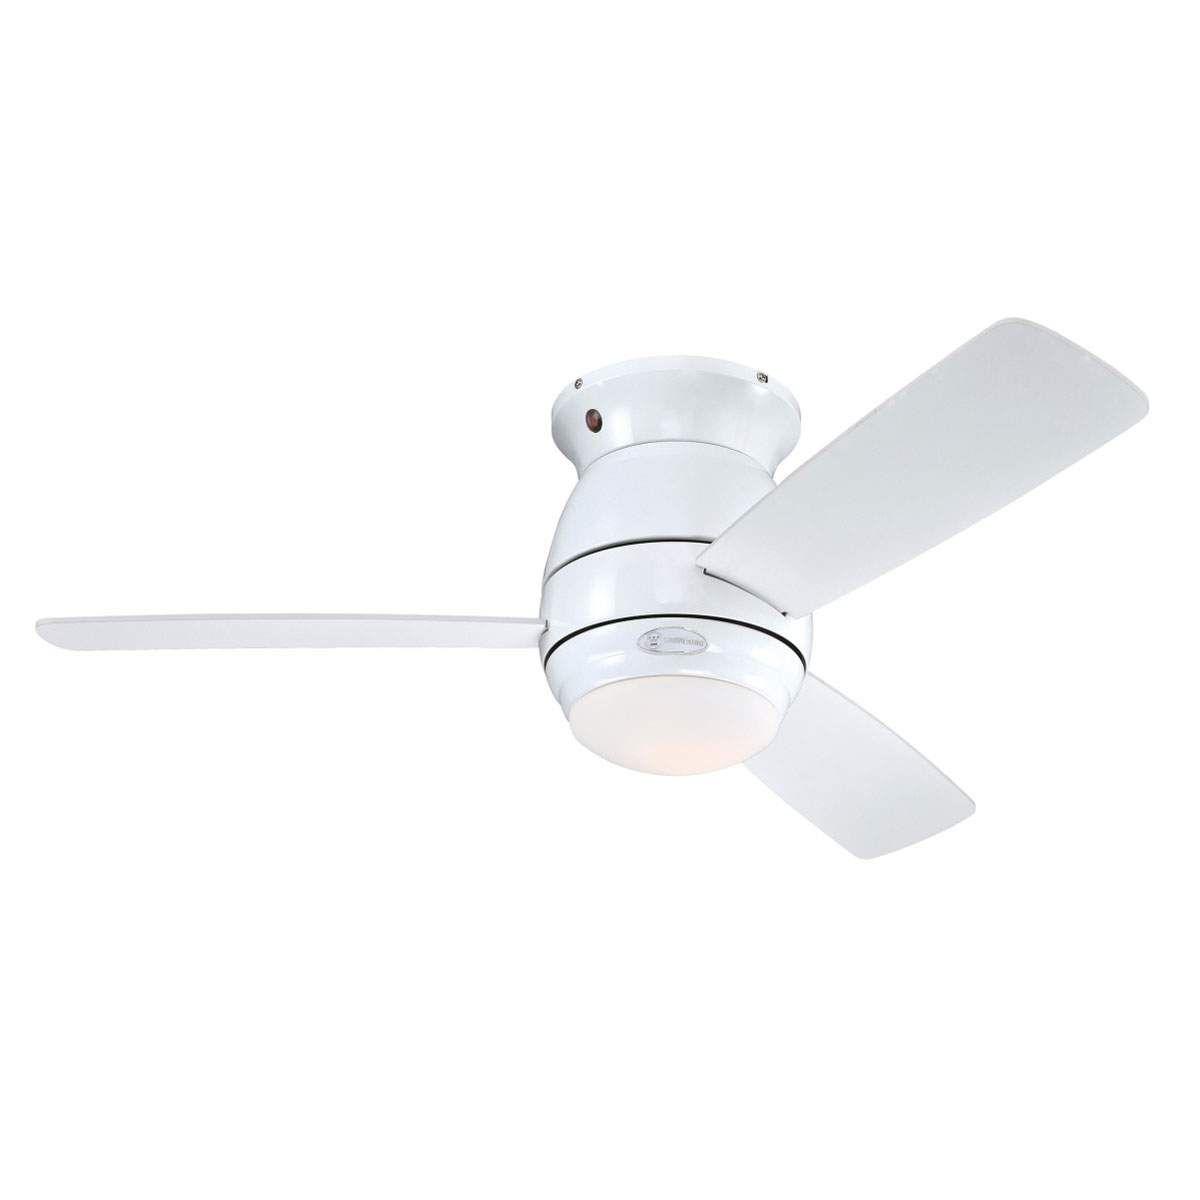 Westinghouse Halley Ventilator Flugel Weiss Ahorn Ventilator Deckenventilator Weiss